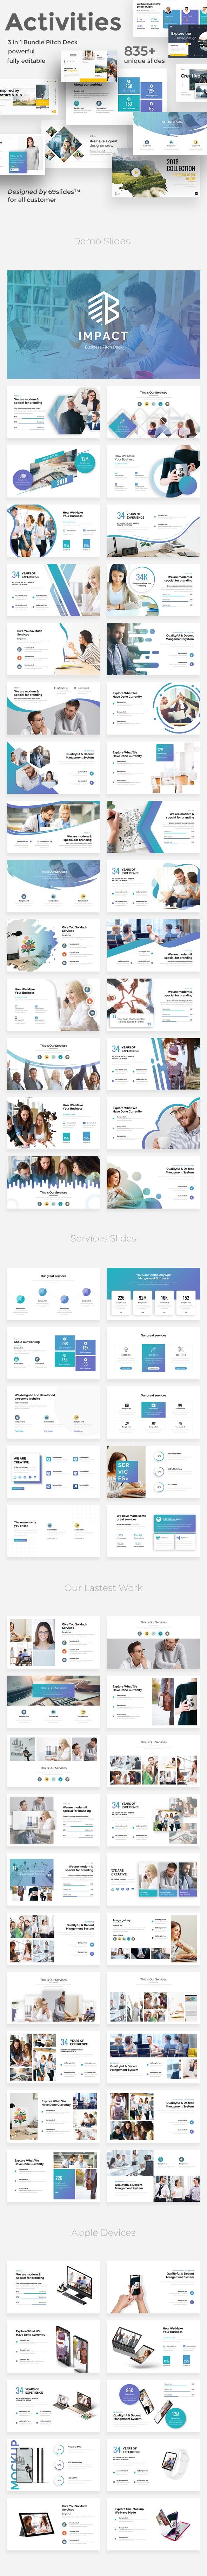 Key Activities 3 in 1 Pitch Deck Bundle Google Slide Template - Google Slides Presentation Templates